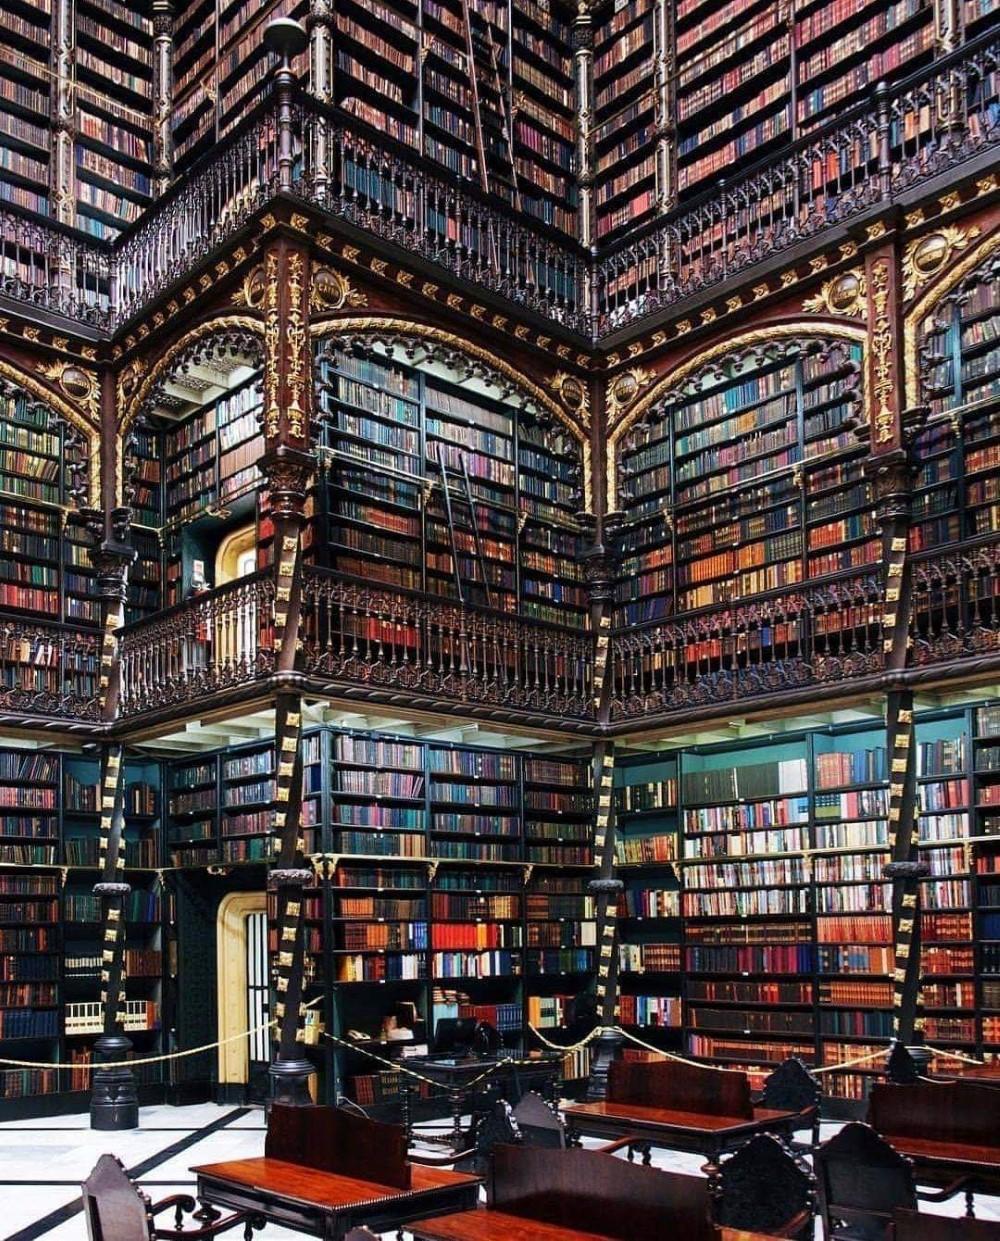 Bibliothèque nationale de Rio de Janeiro - Brésil